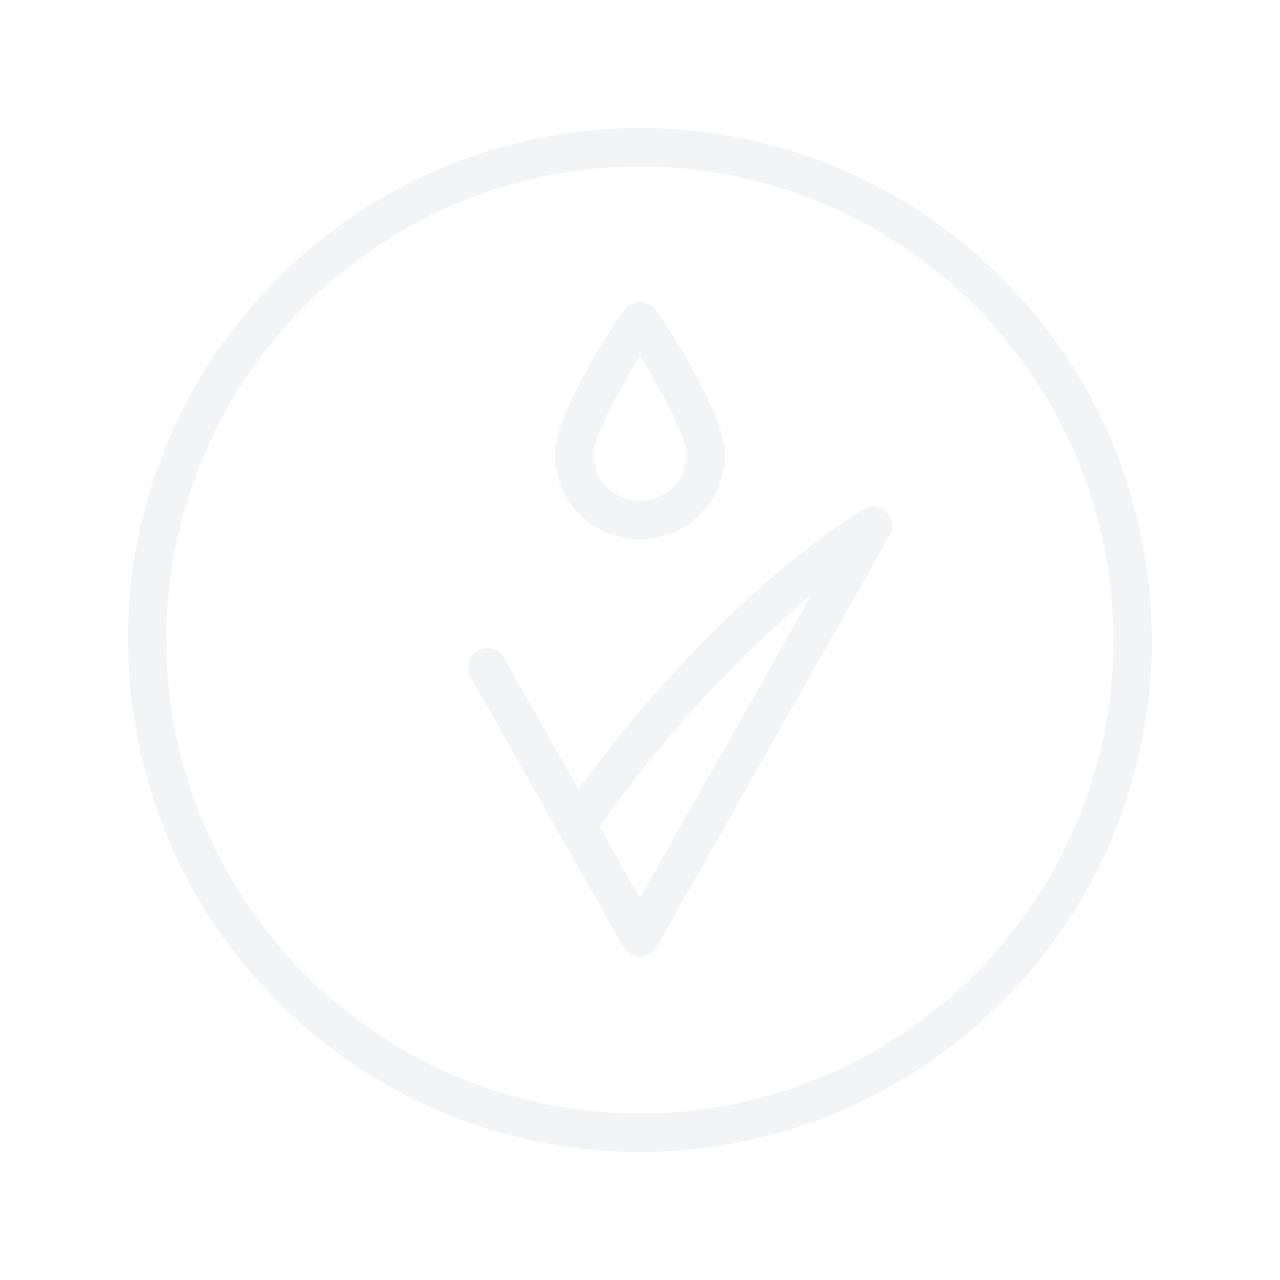 HOIA Beard Serum сыворотка для бороды 30ml